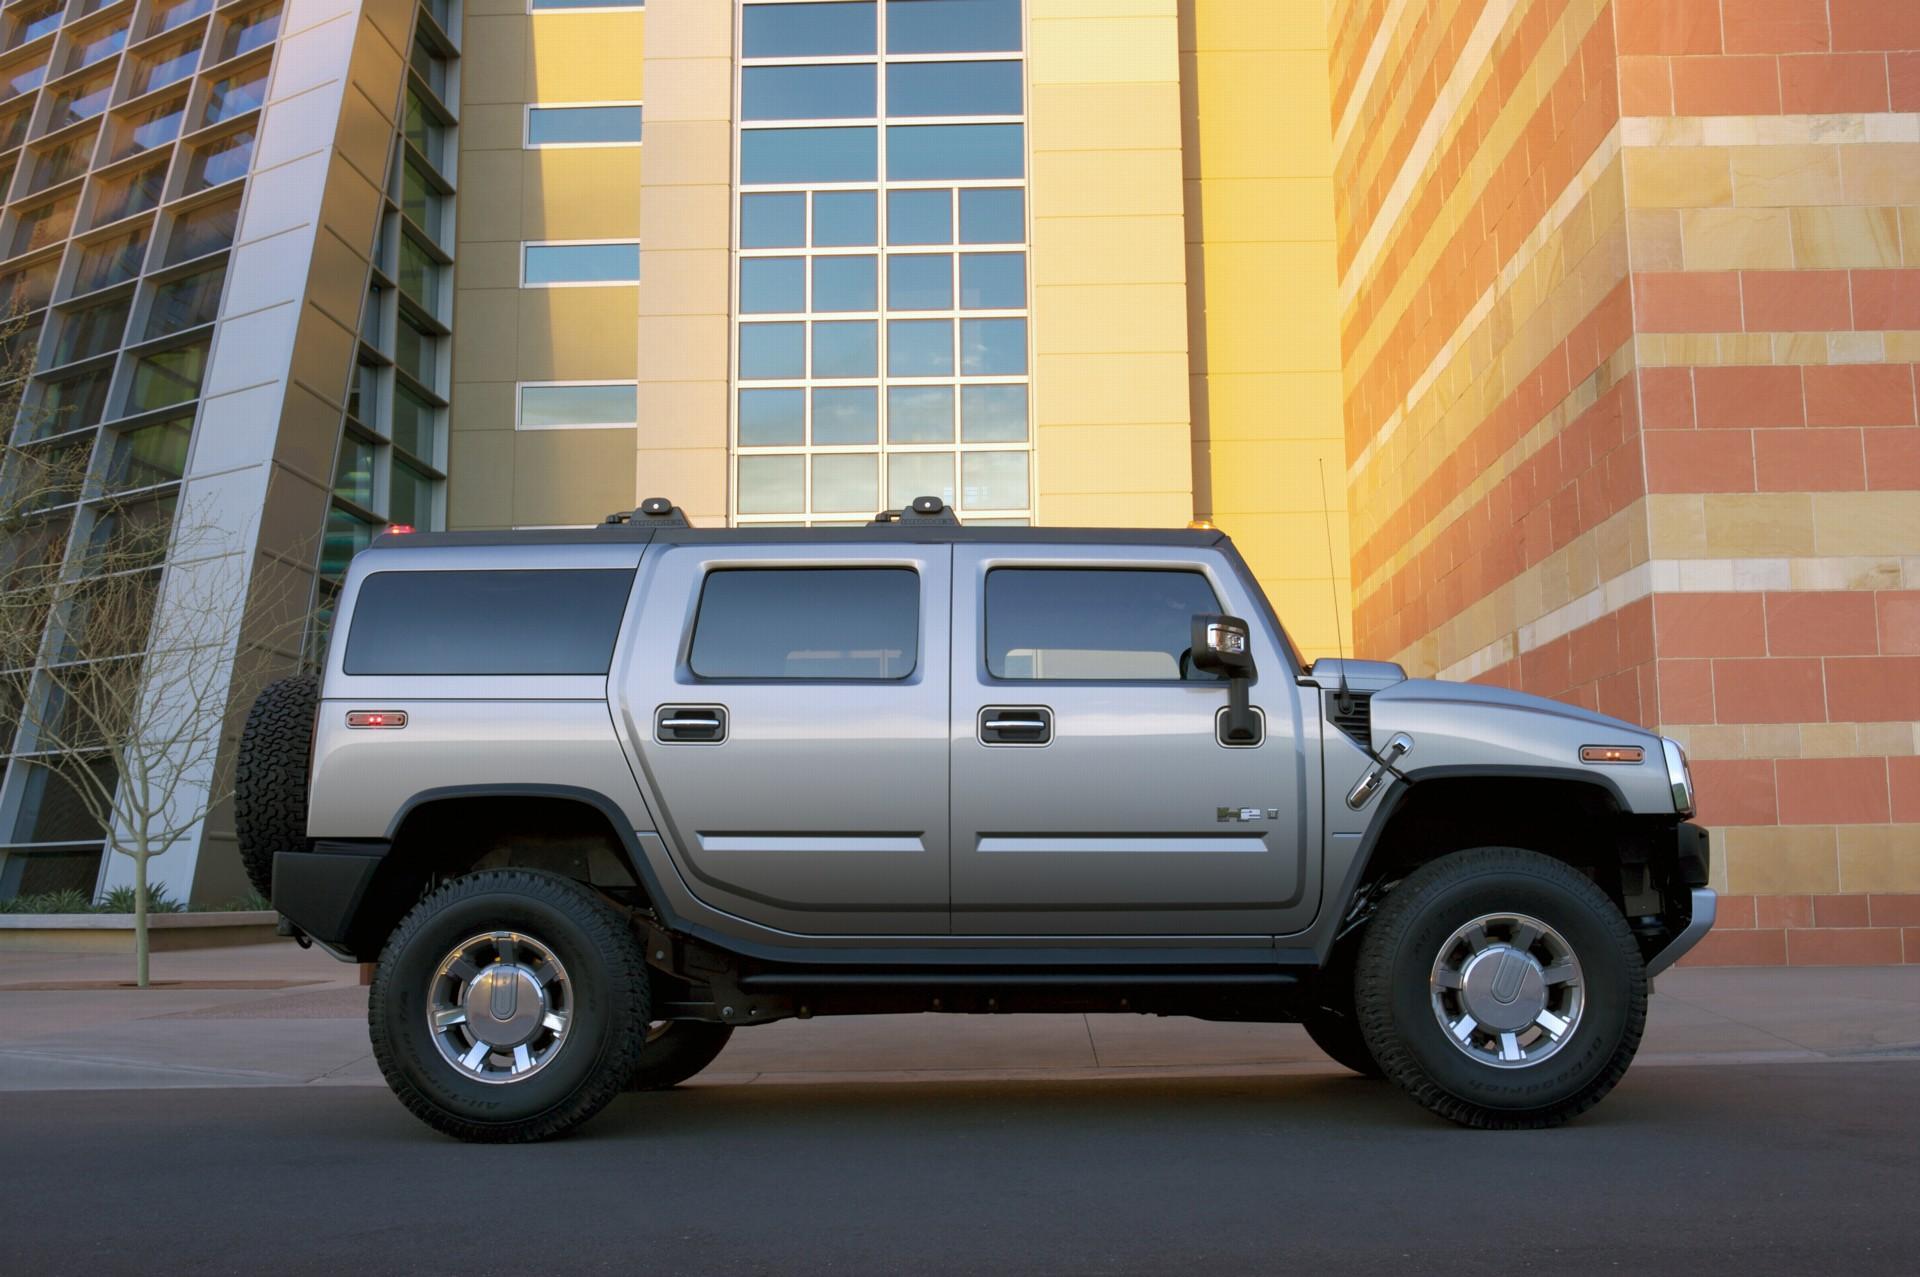 2008 Hummer H2 conceptcarz